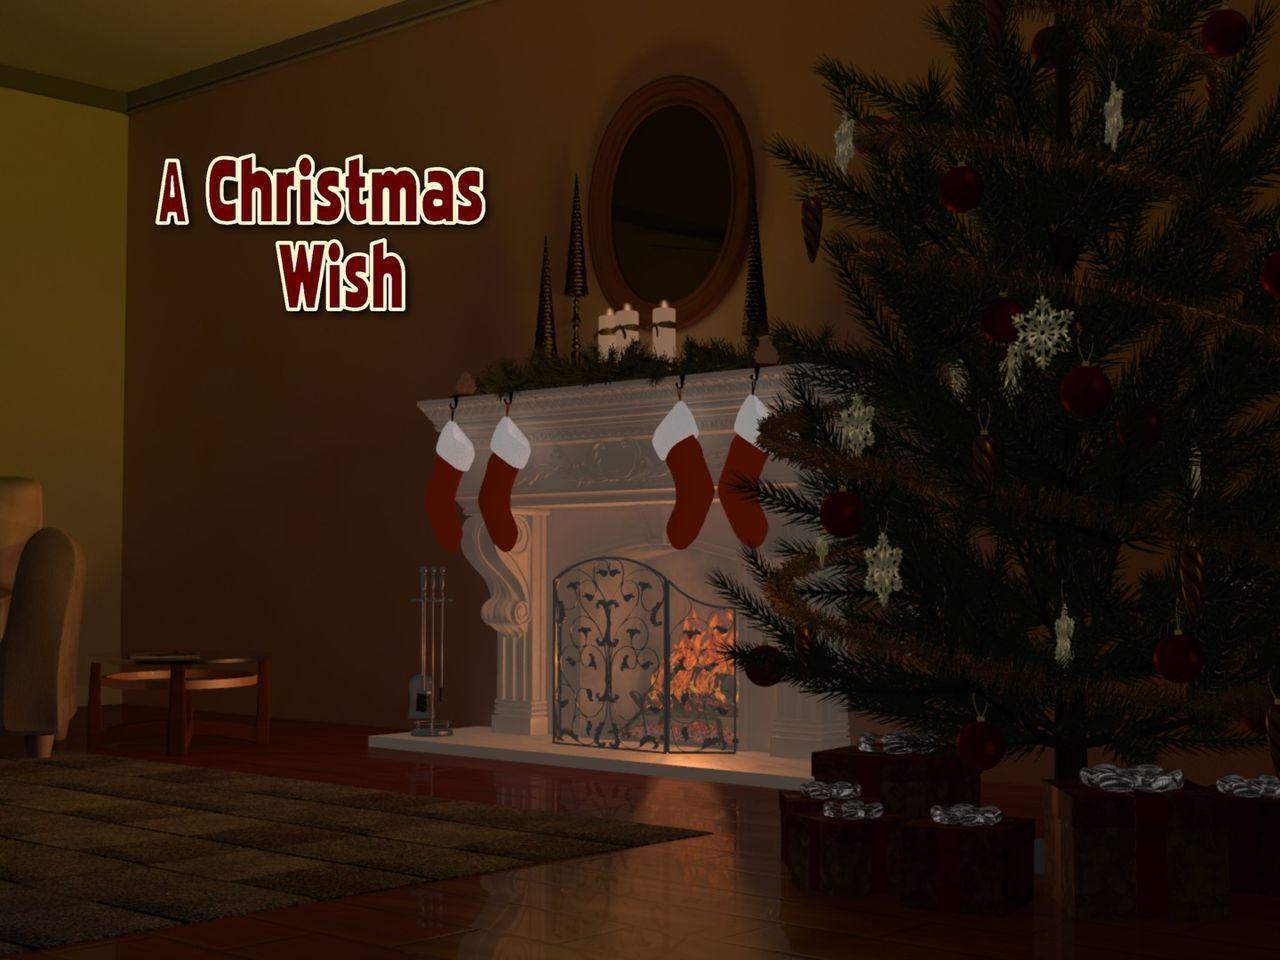 [Telsis] A Christmas Wish